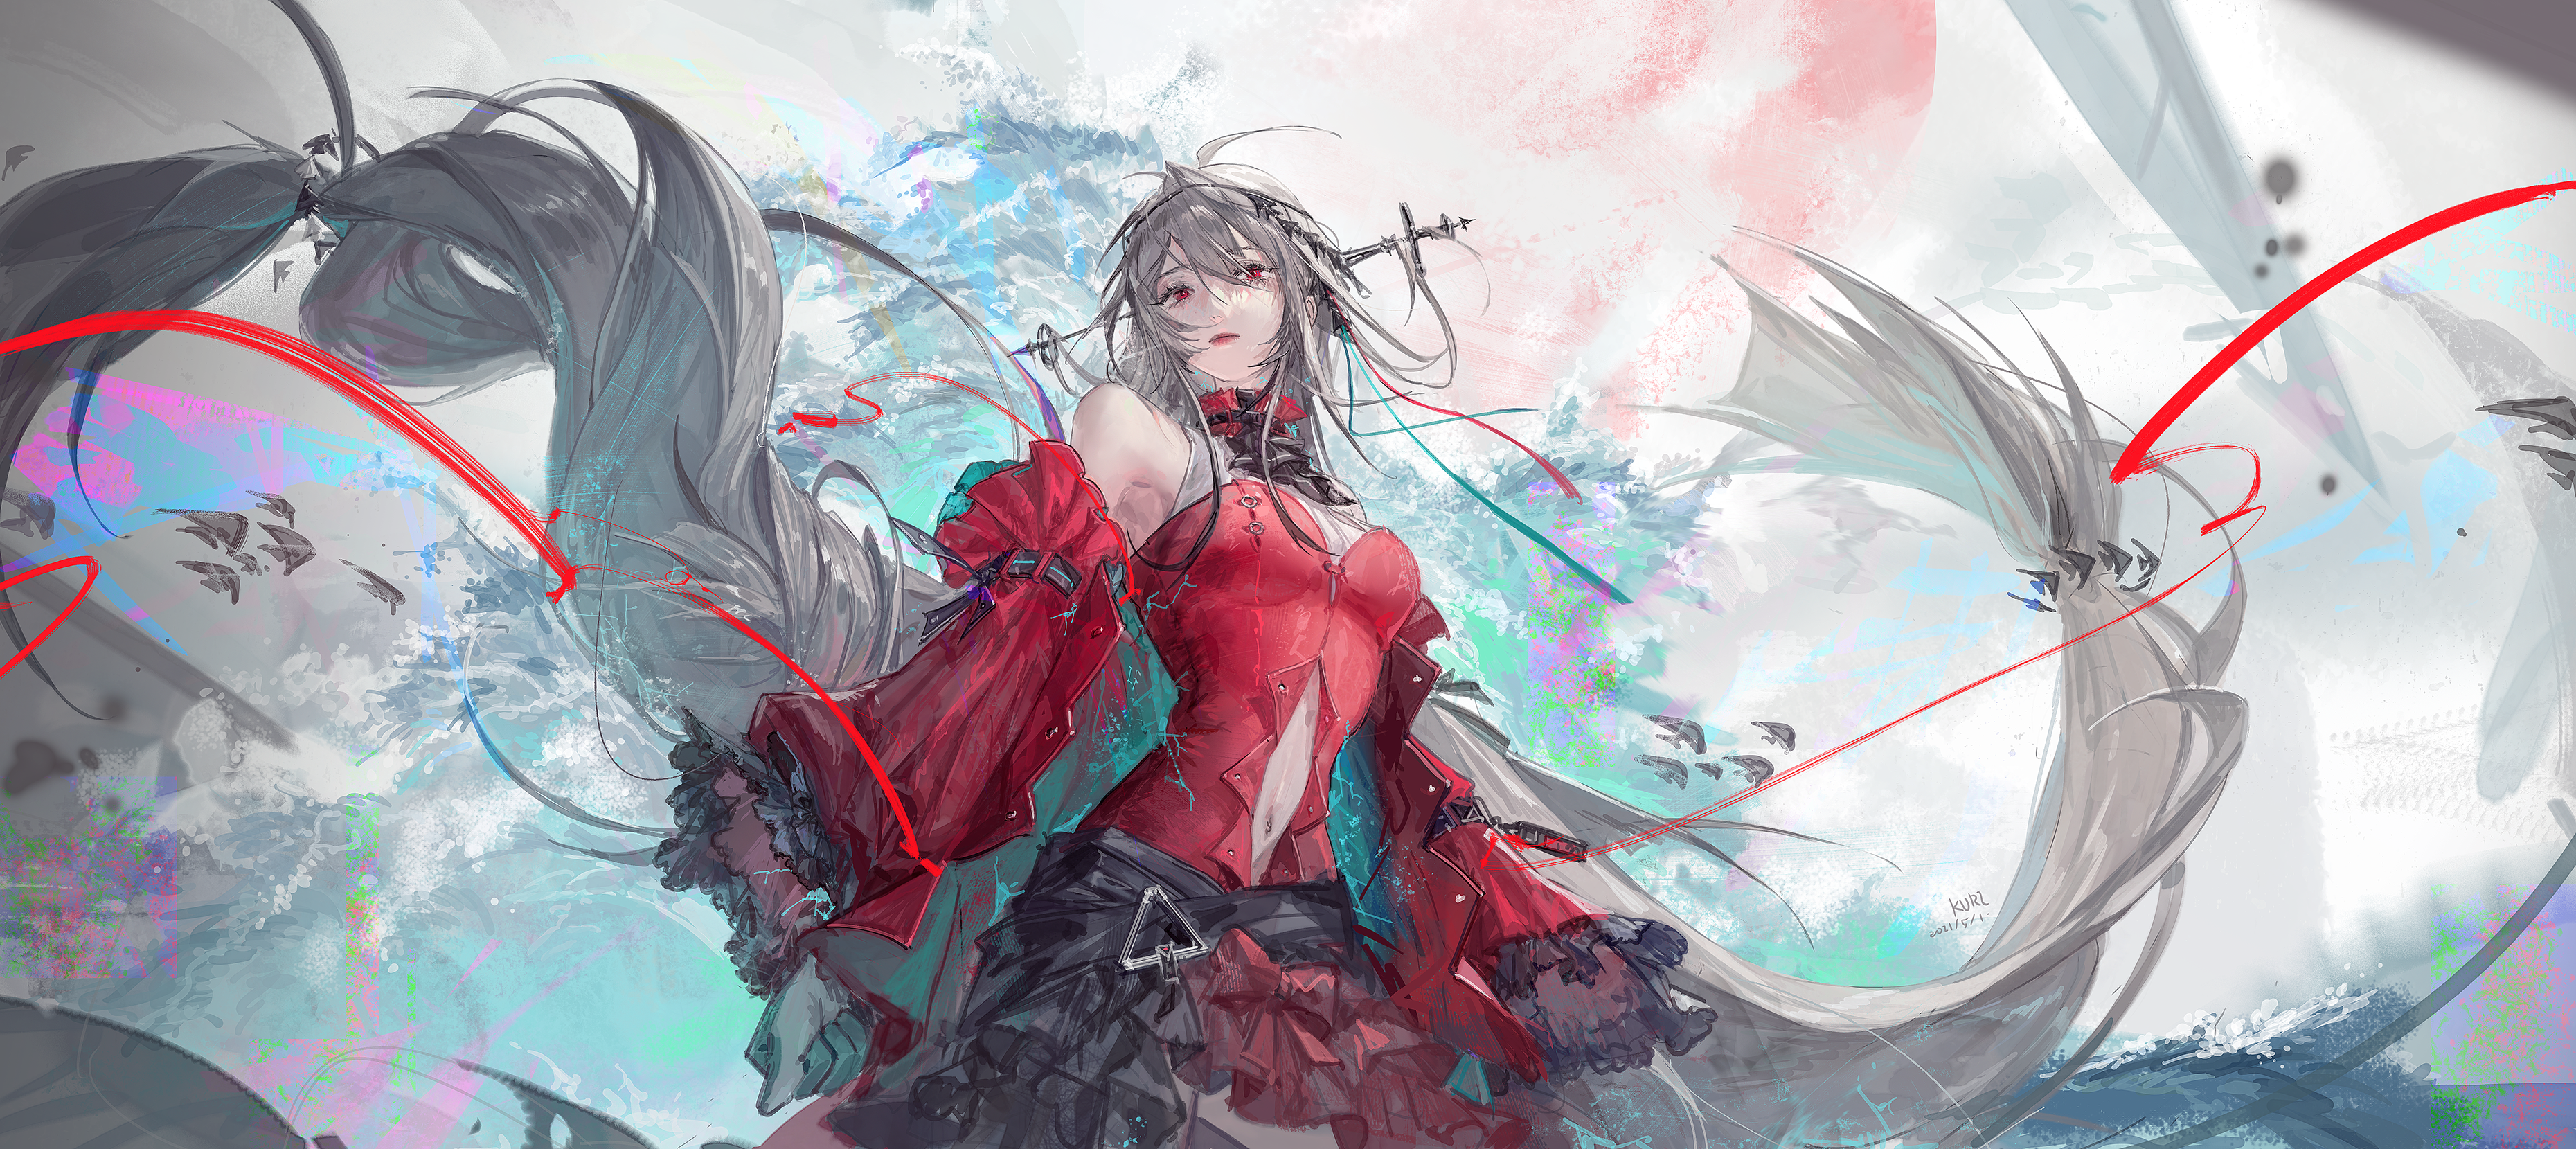 Anime Anime Girls Arknights Skadi Arknights Blonde Long Hair Red Dress Clouds Red Eyes Ribbons Looki 3720x1659